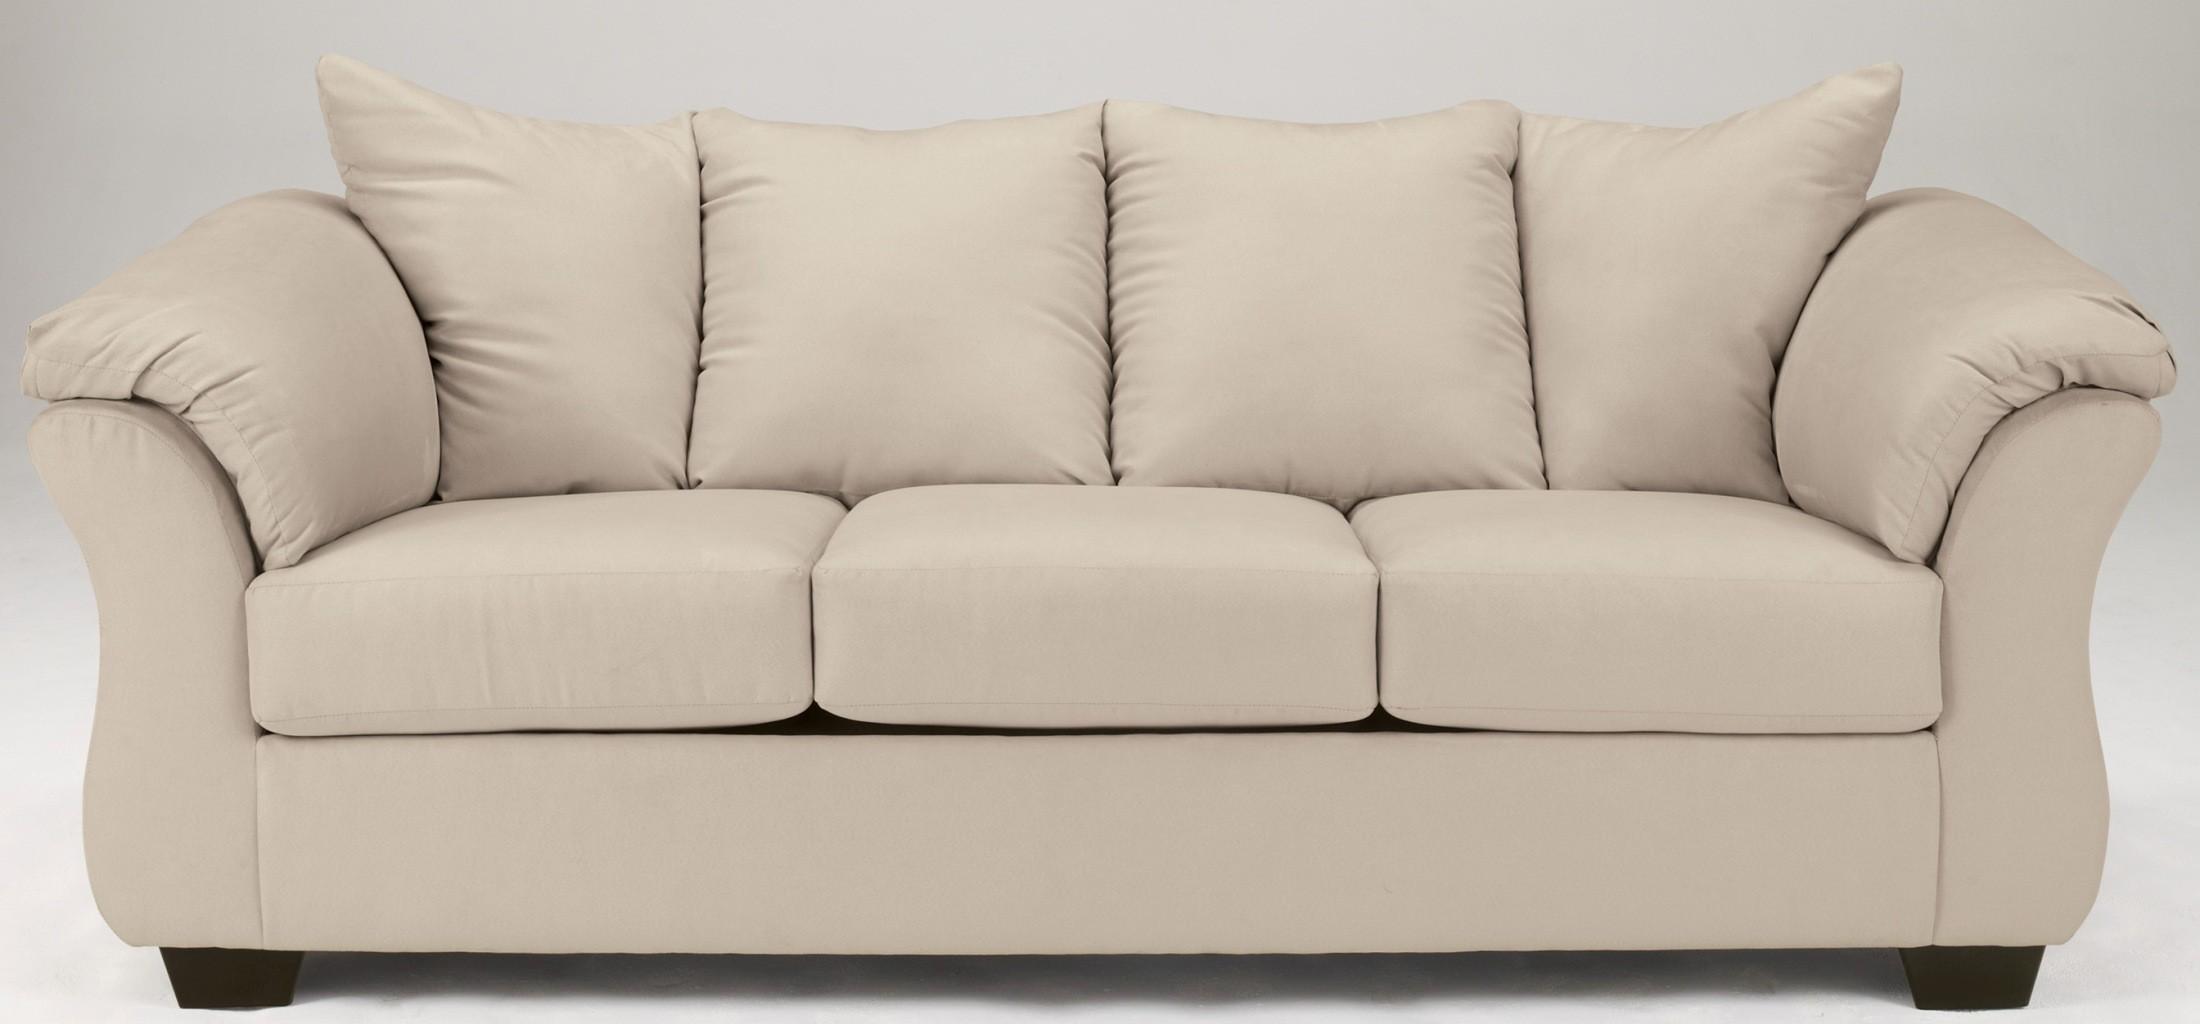 Darcy Gray Stone Sofa From Ashley 7500038 Coleman